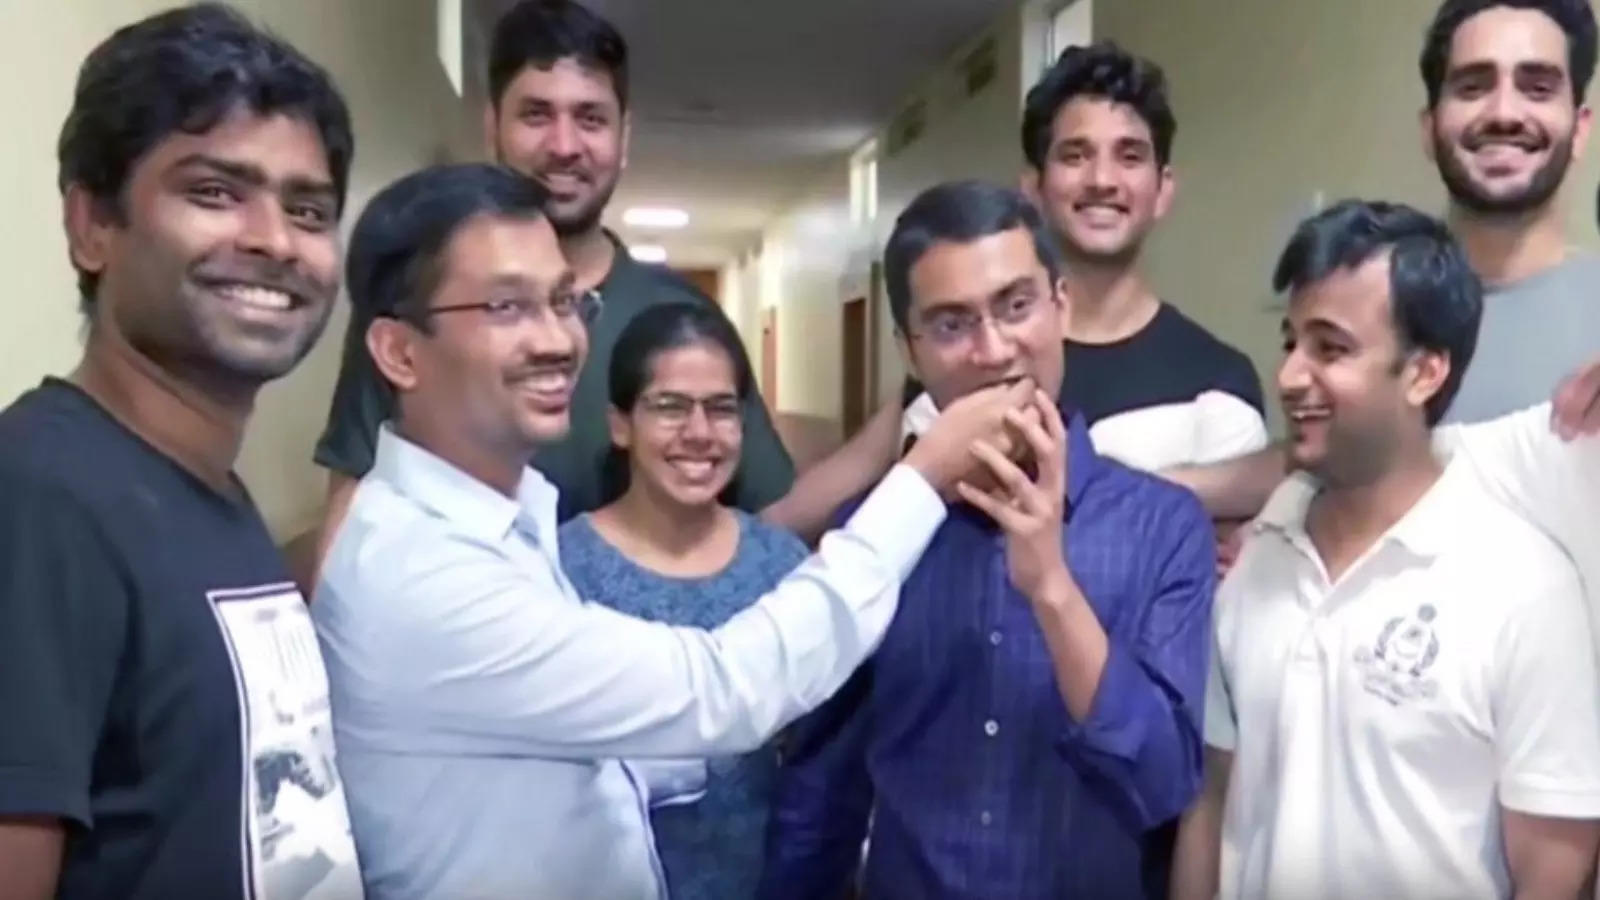 upsc-civil-services-result-declared-bihar-boy-tops-exam